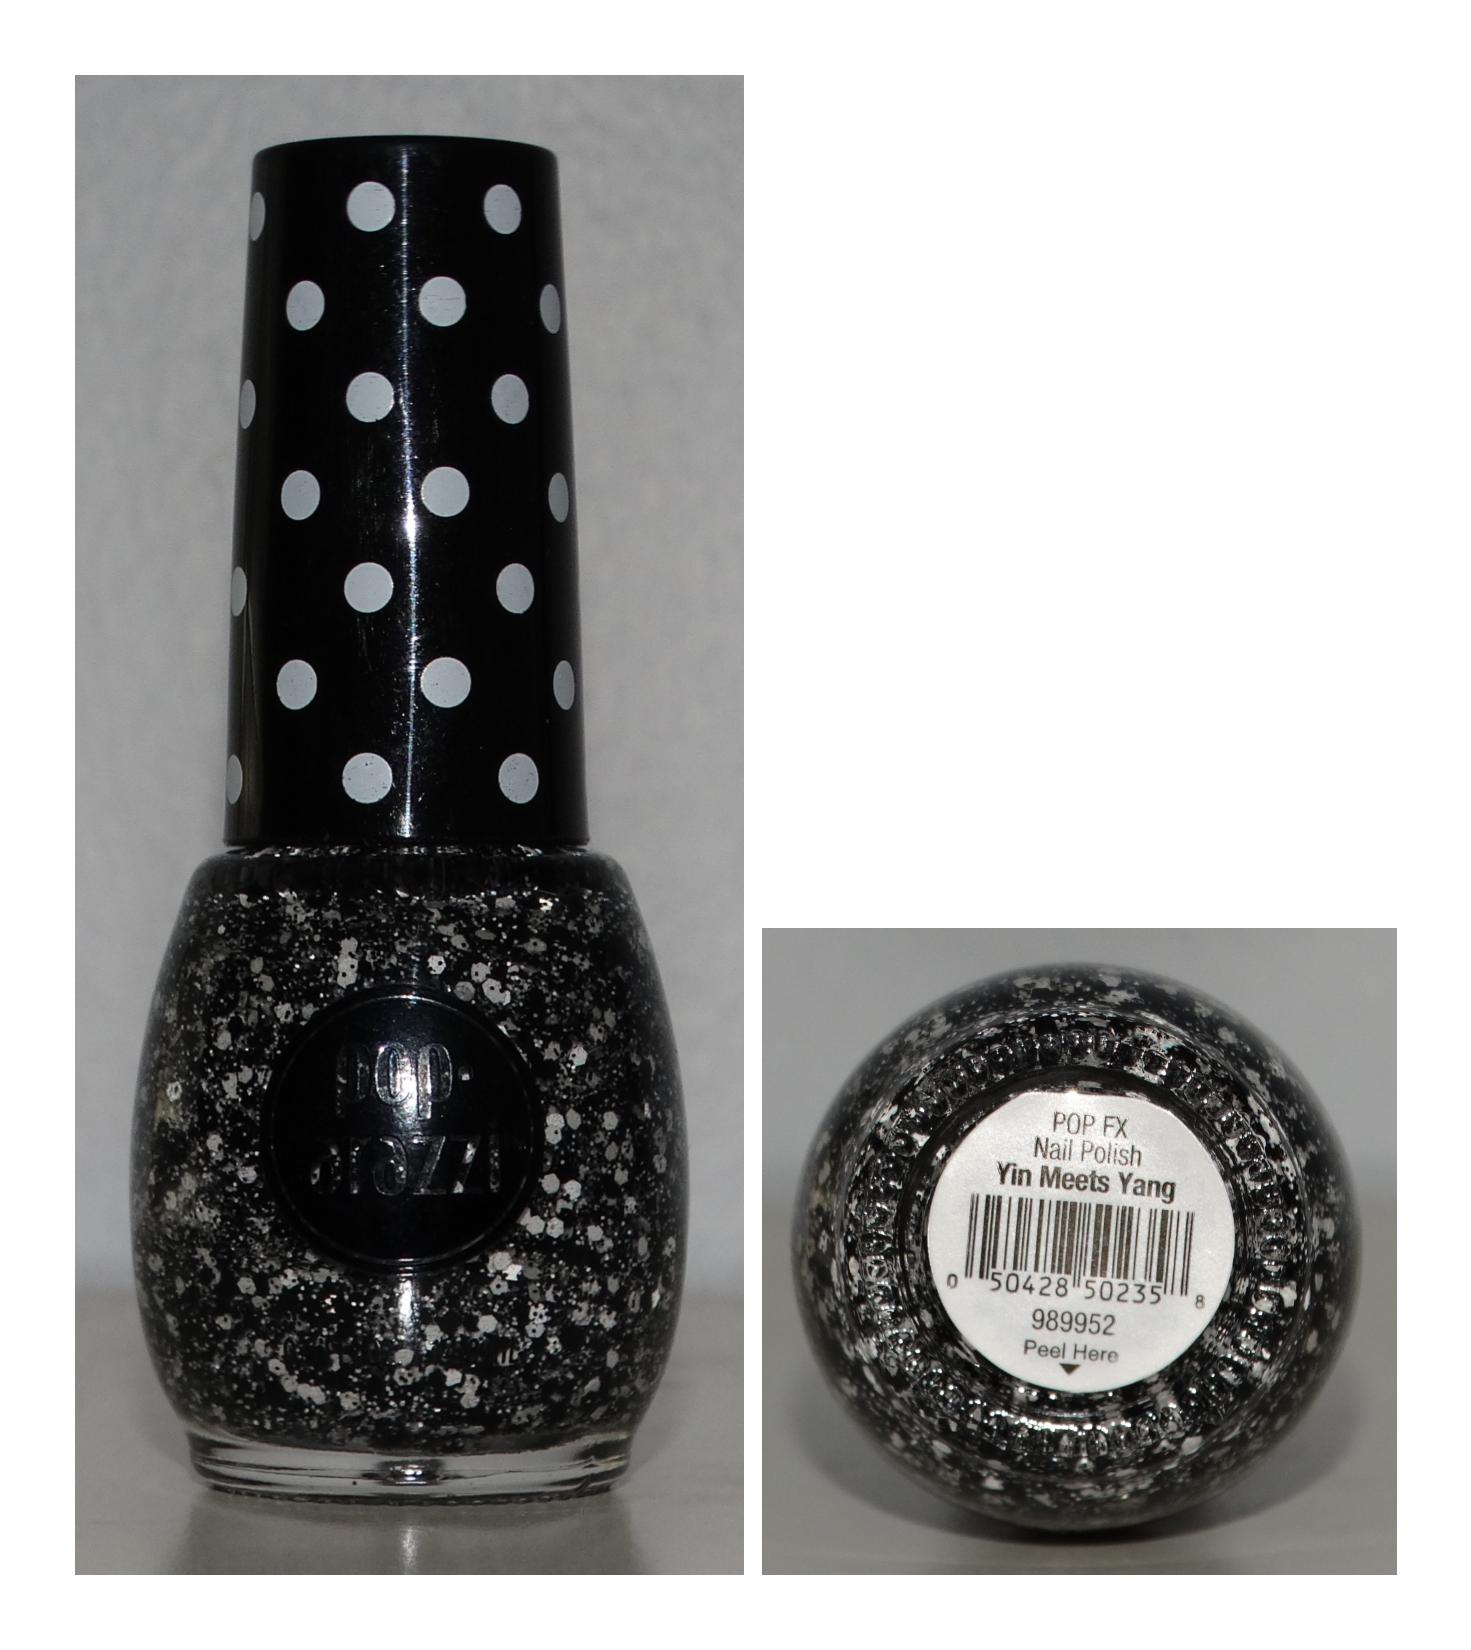 Pop-arazzi Yin Meets Yang  Black and White Glitter